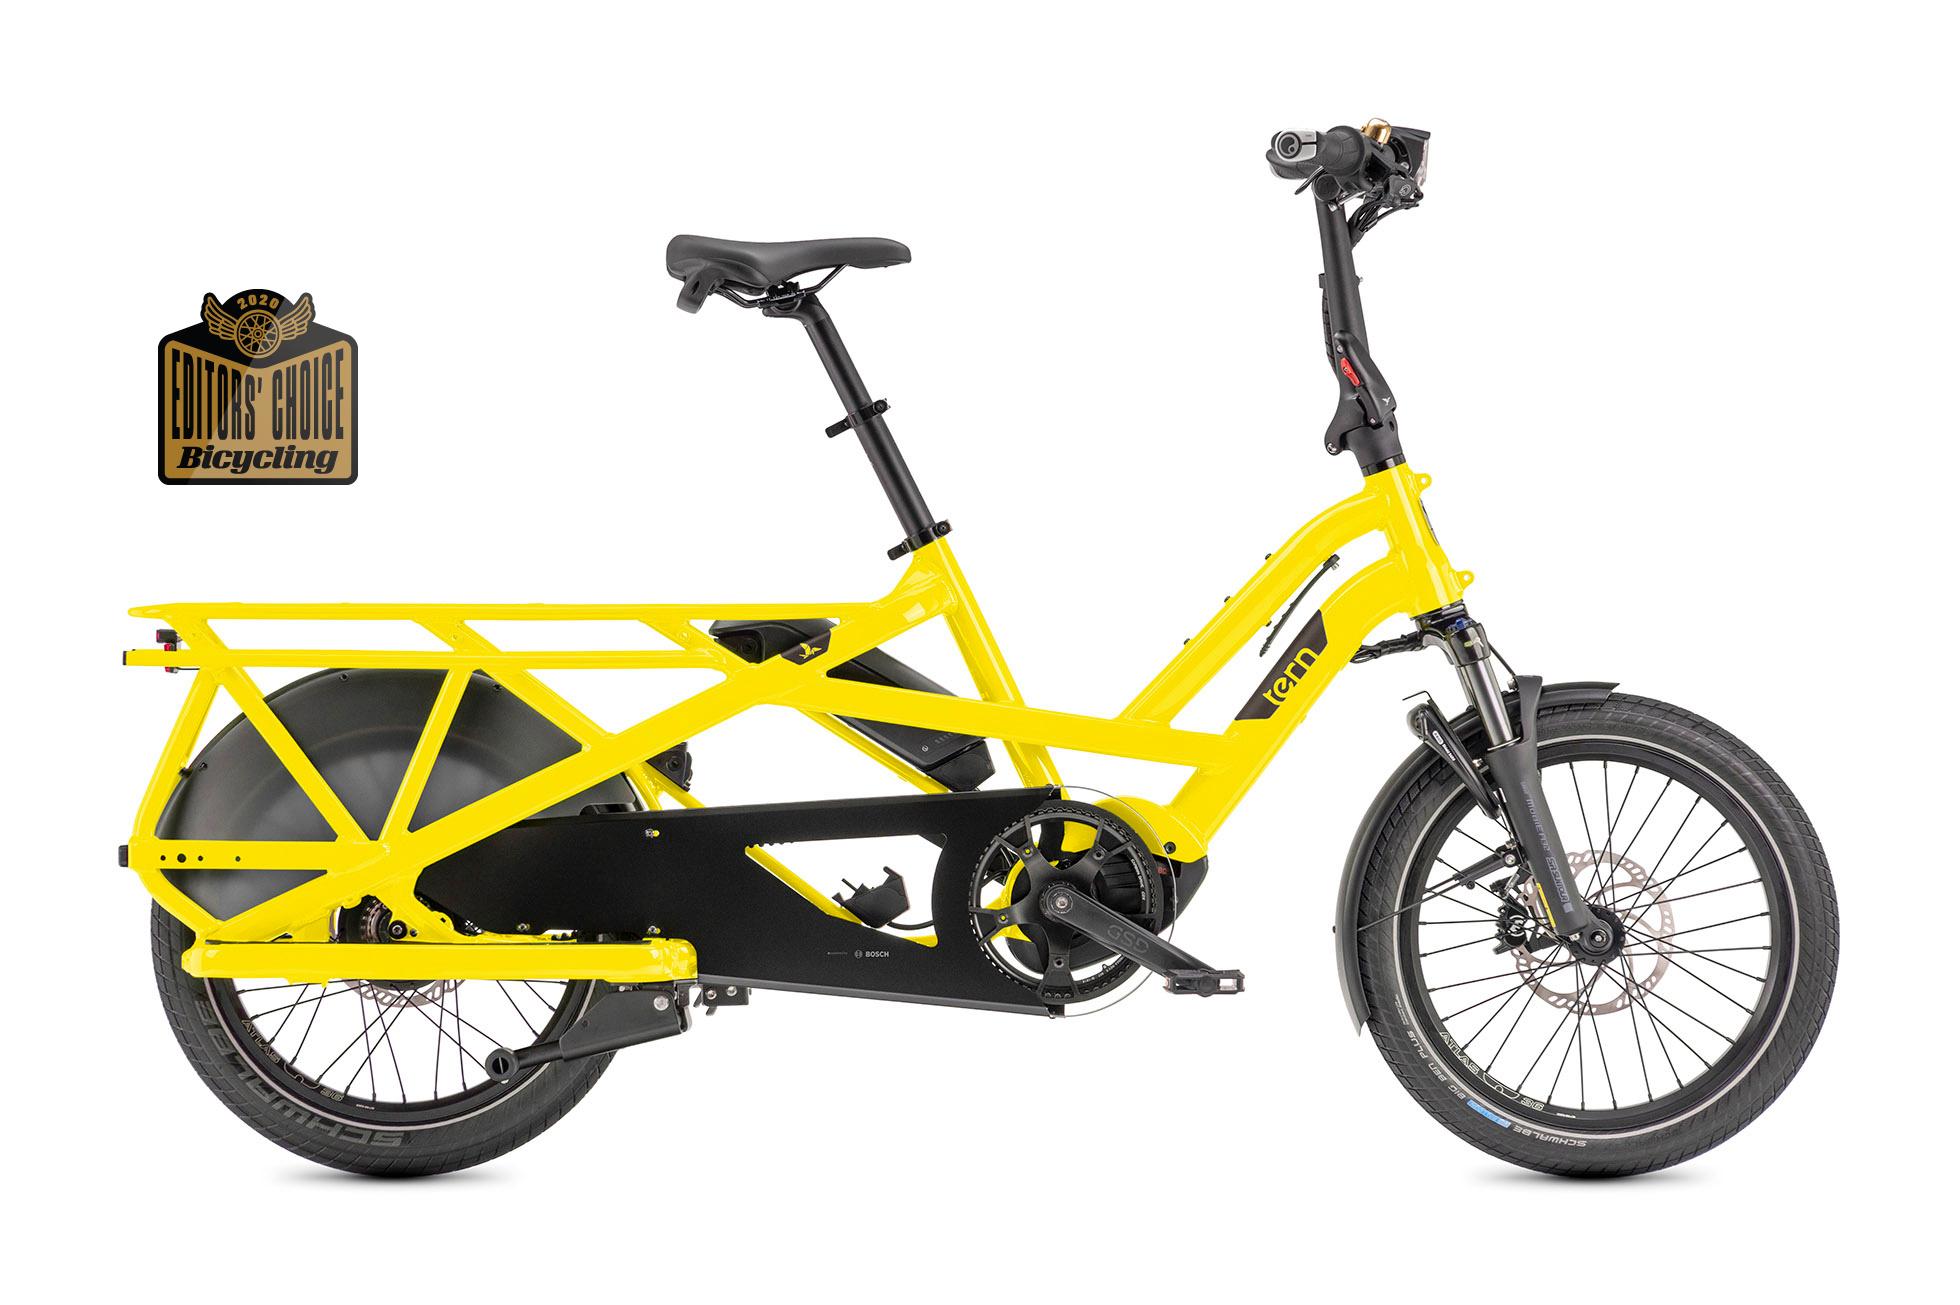 Tern Tern GSD V2 S10 LX Cargo Bike, 500Wh, School Bus Yellow, Single Battery